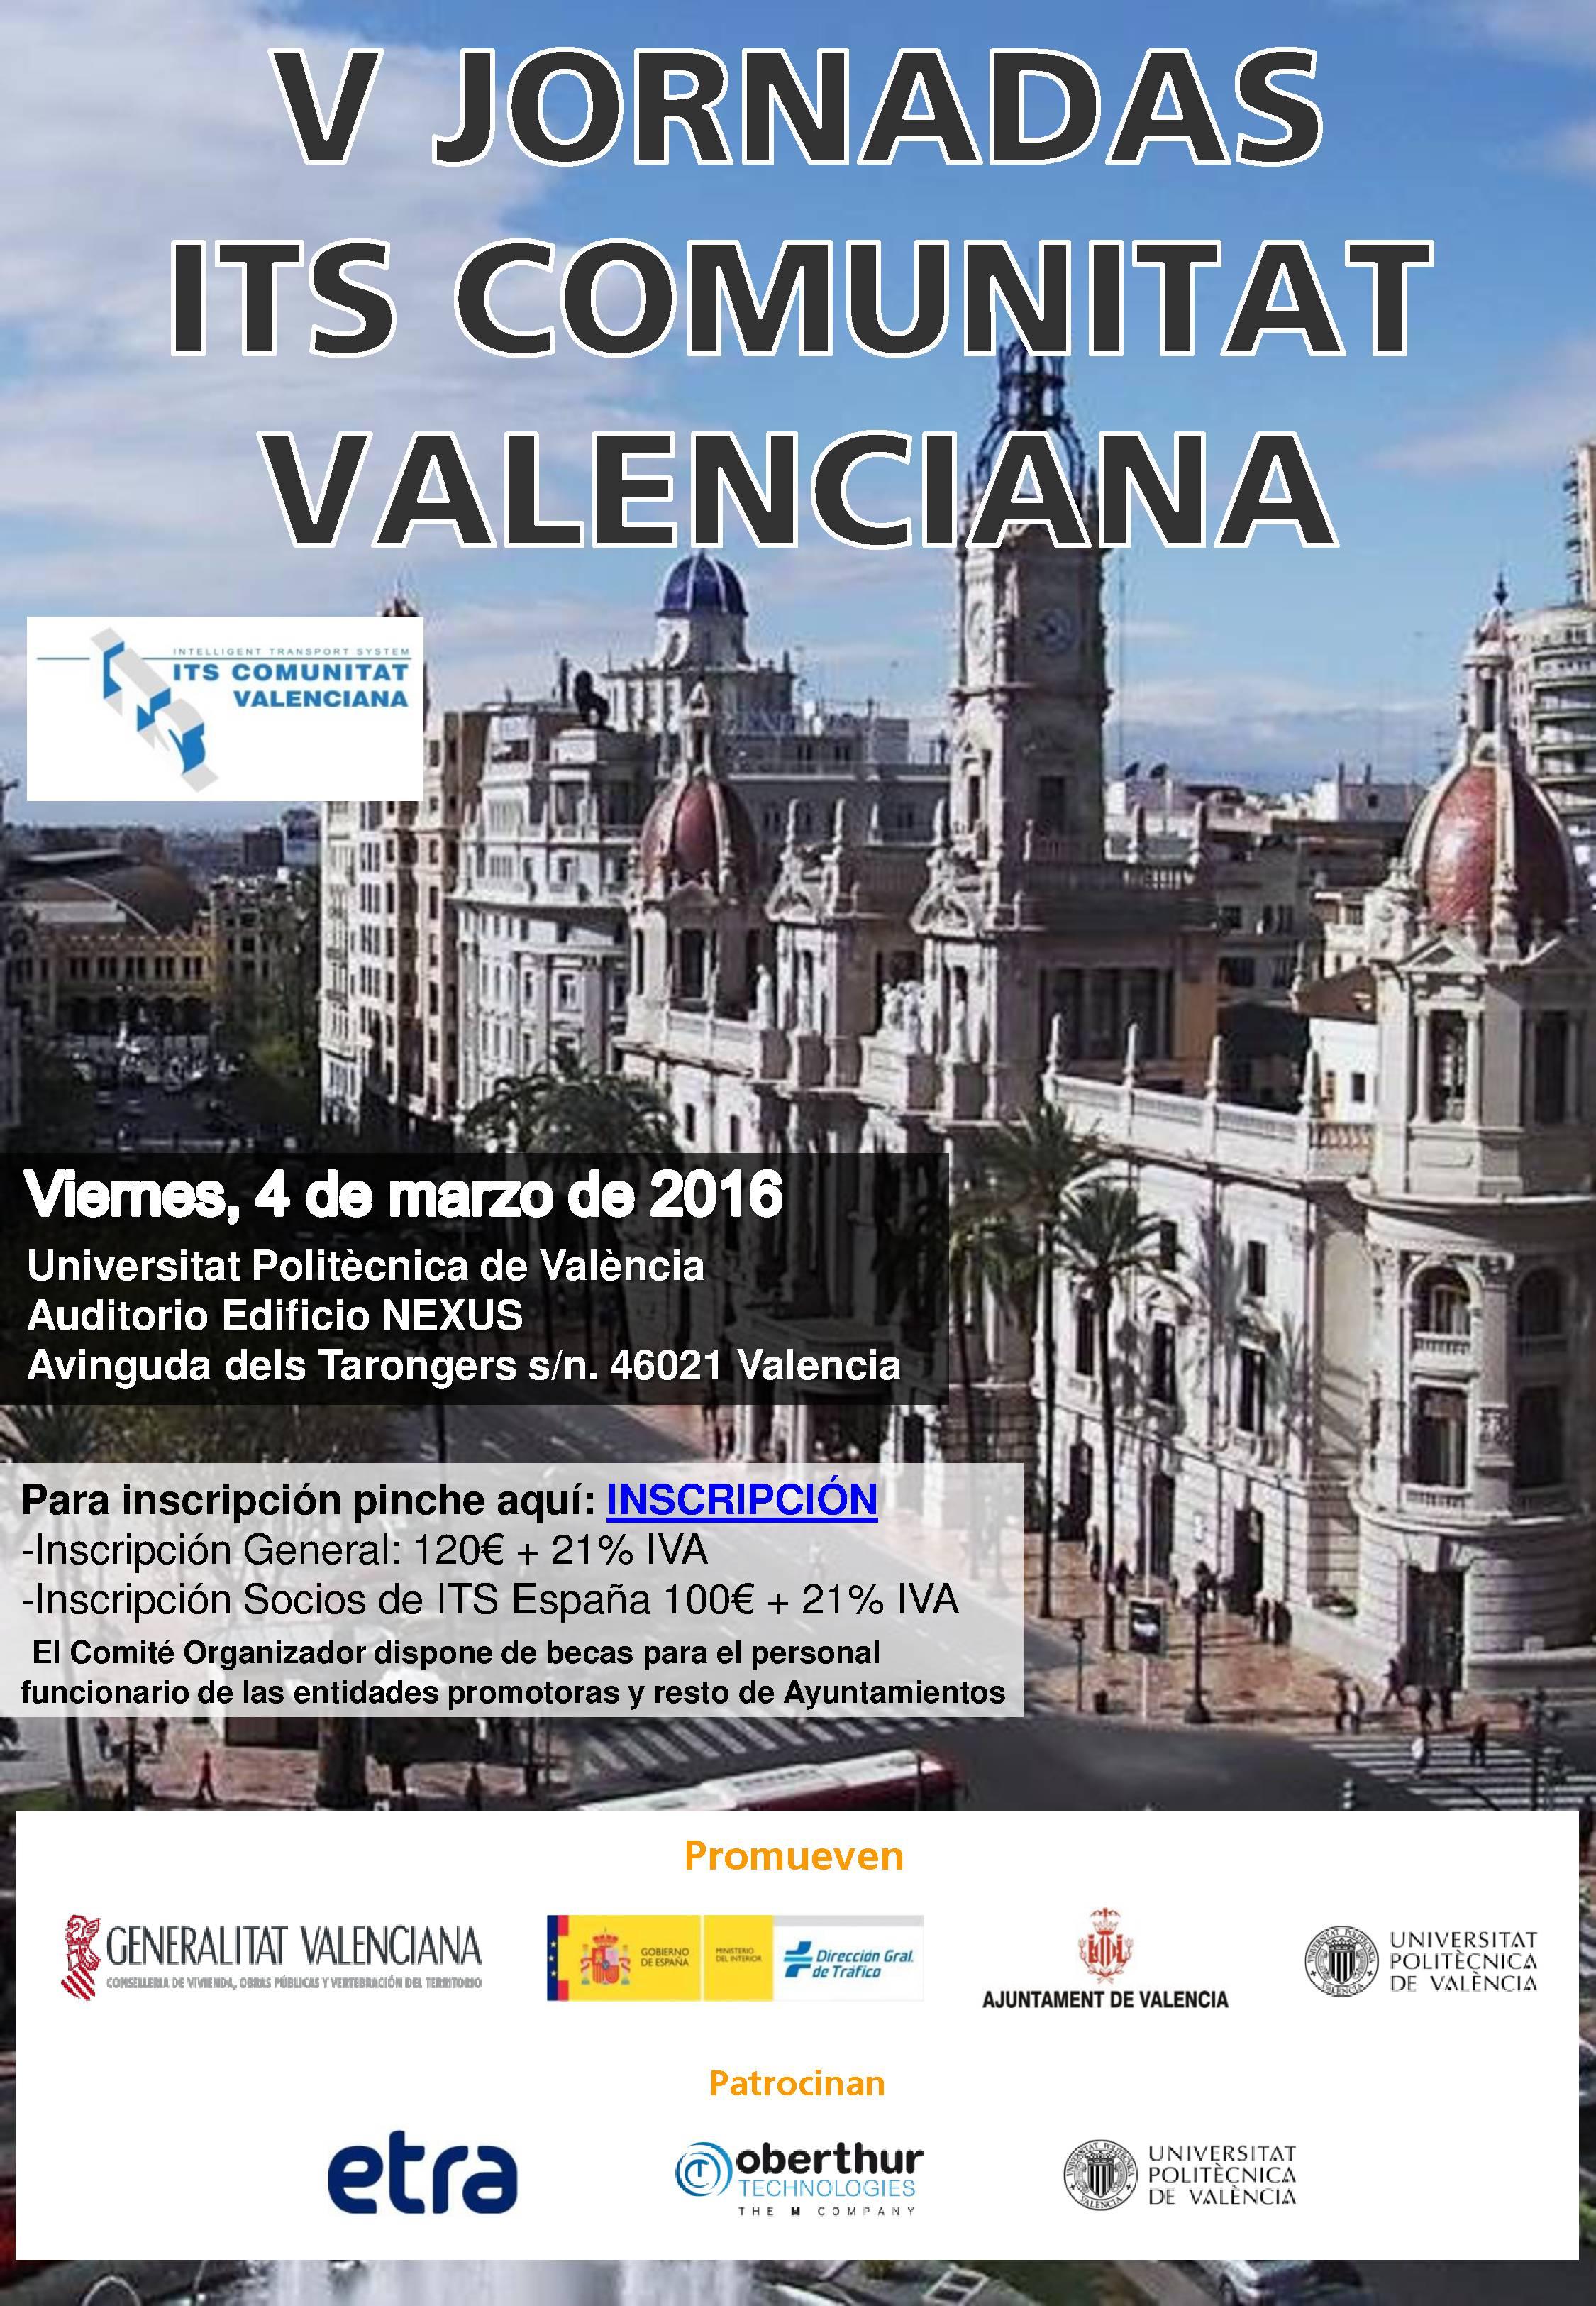 20160304-v-jornadas-its-comunitat-valenciana